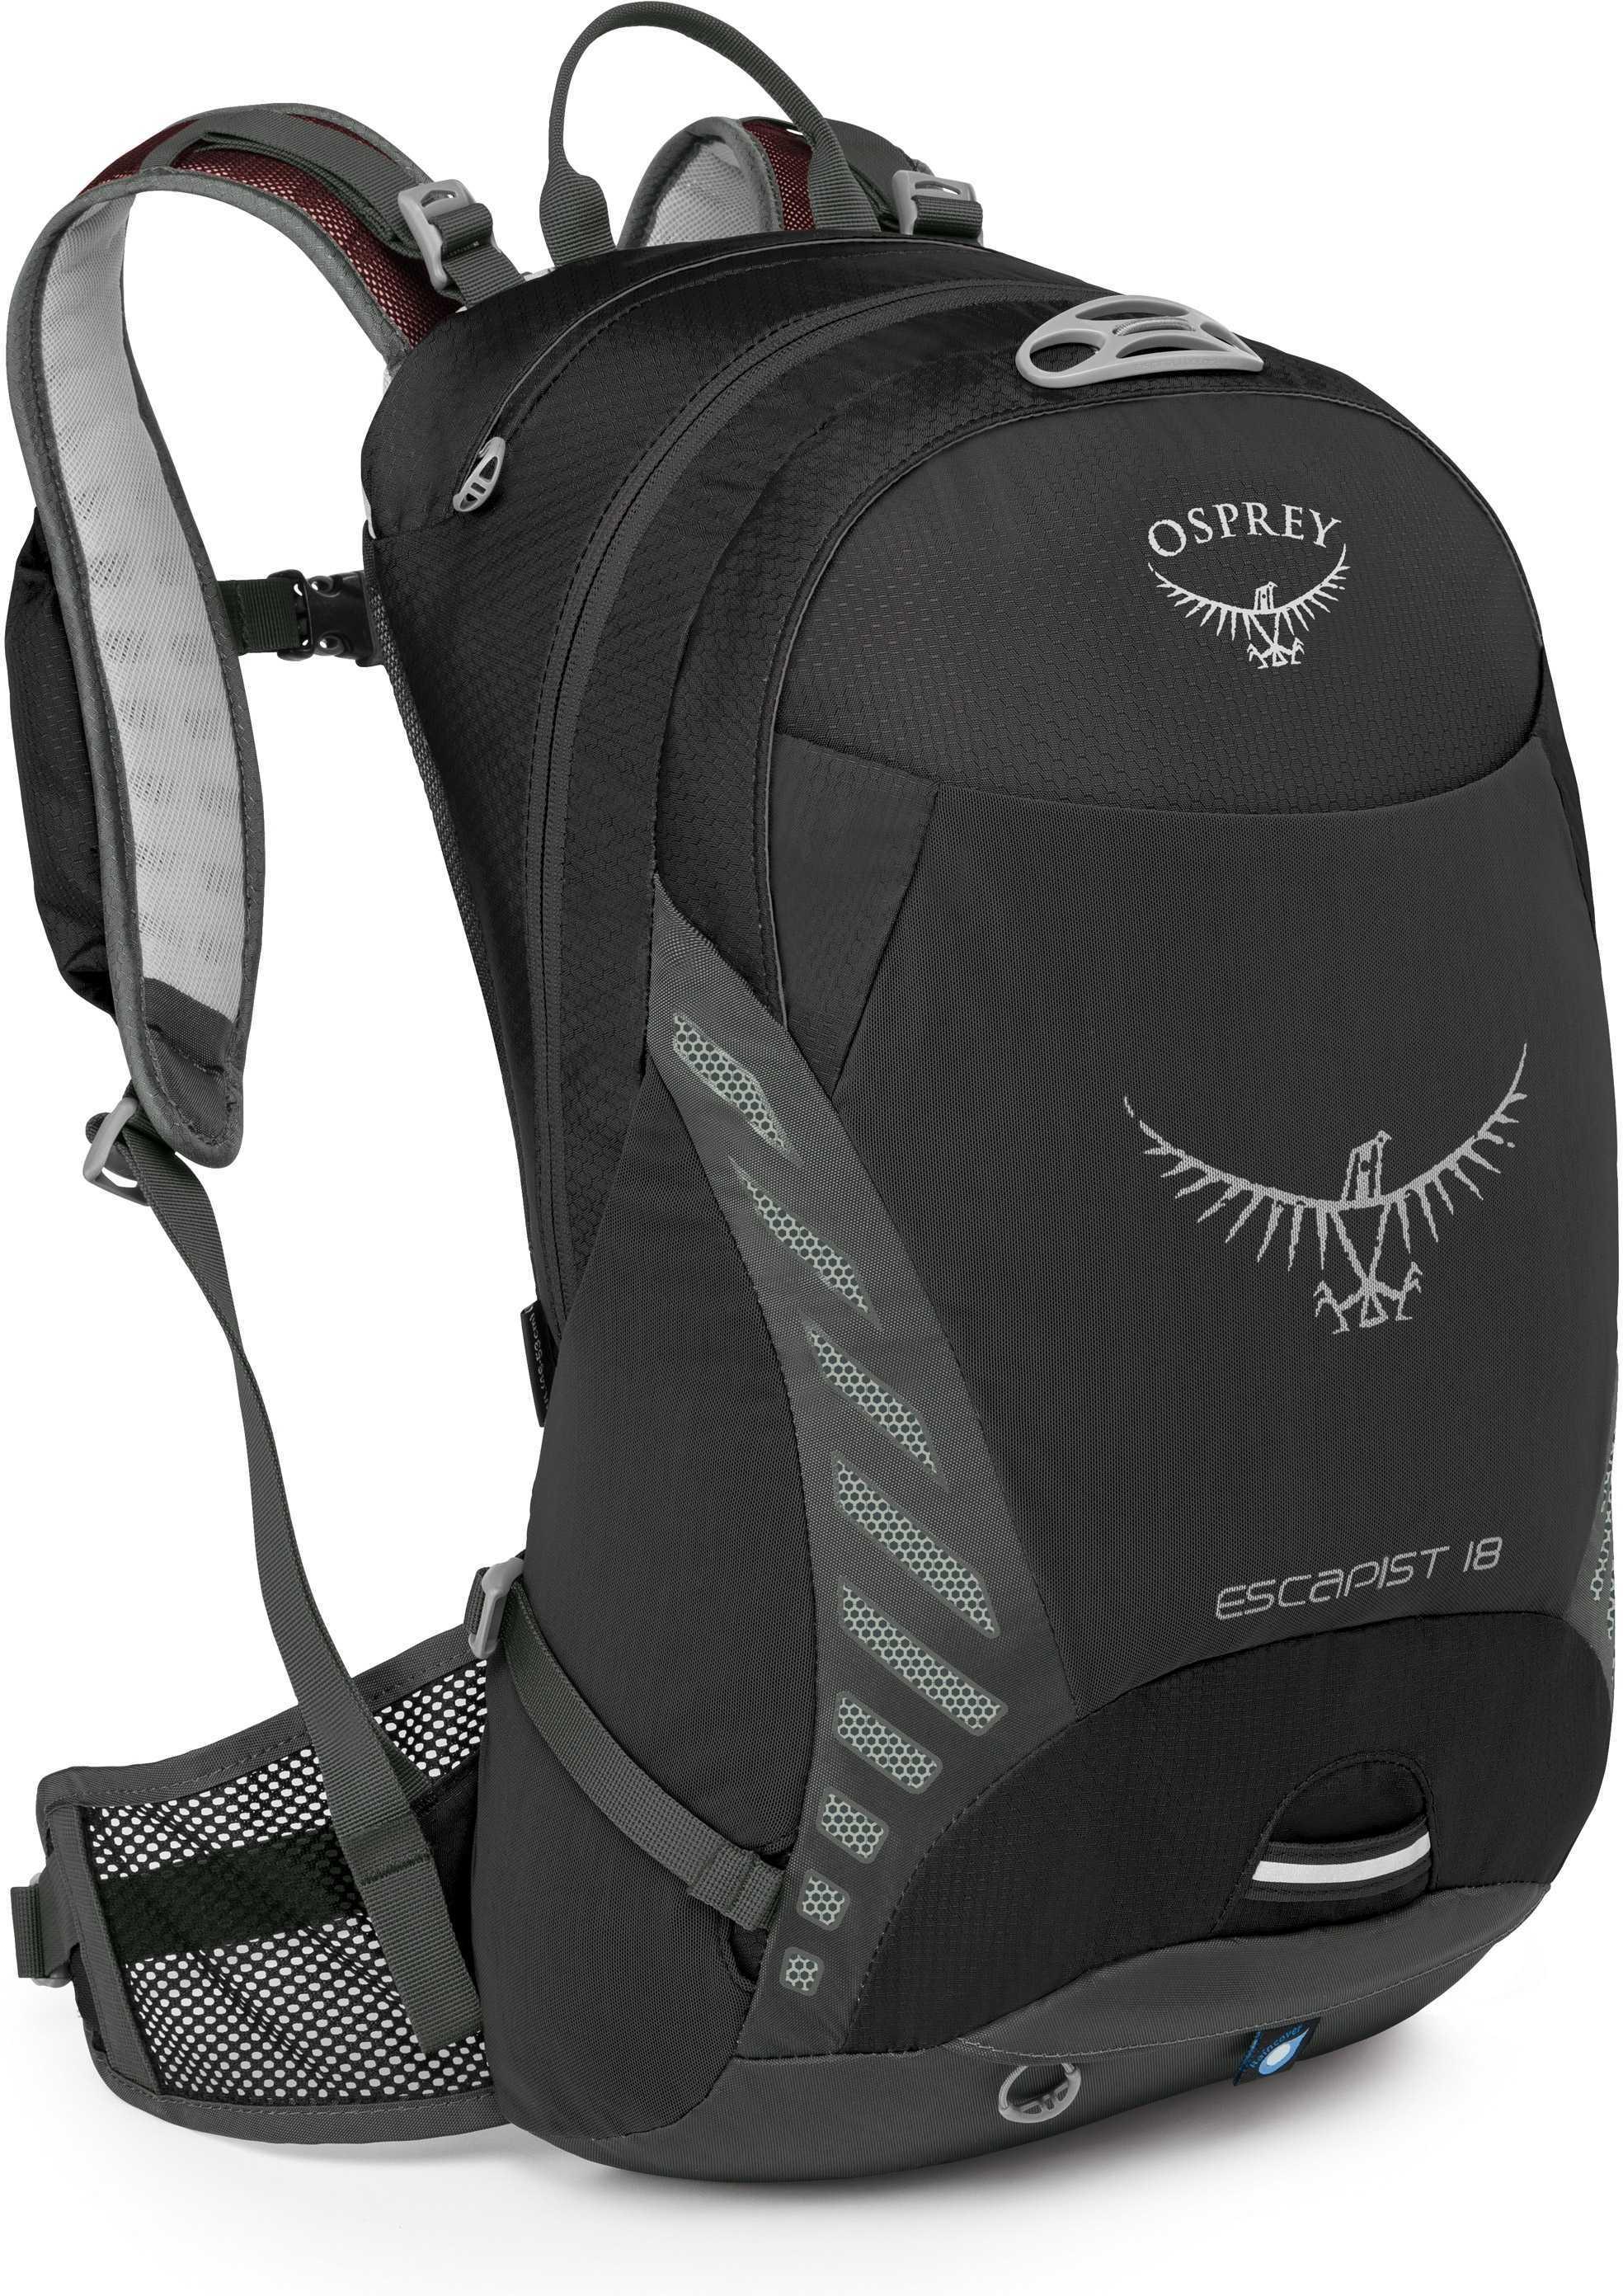 Ryggsäck Osprey Escapist 18 l small/medium svart